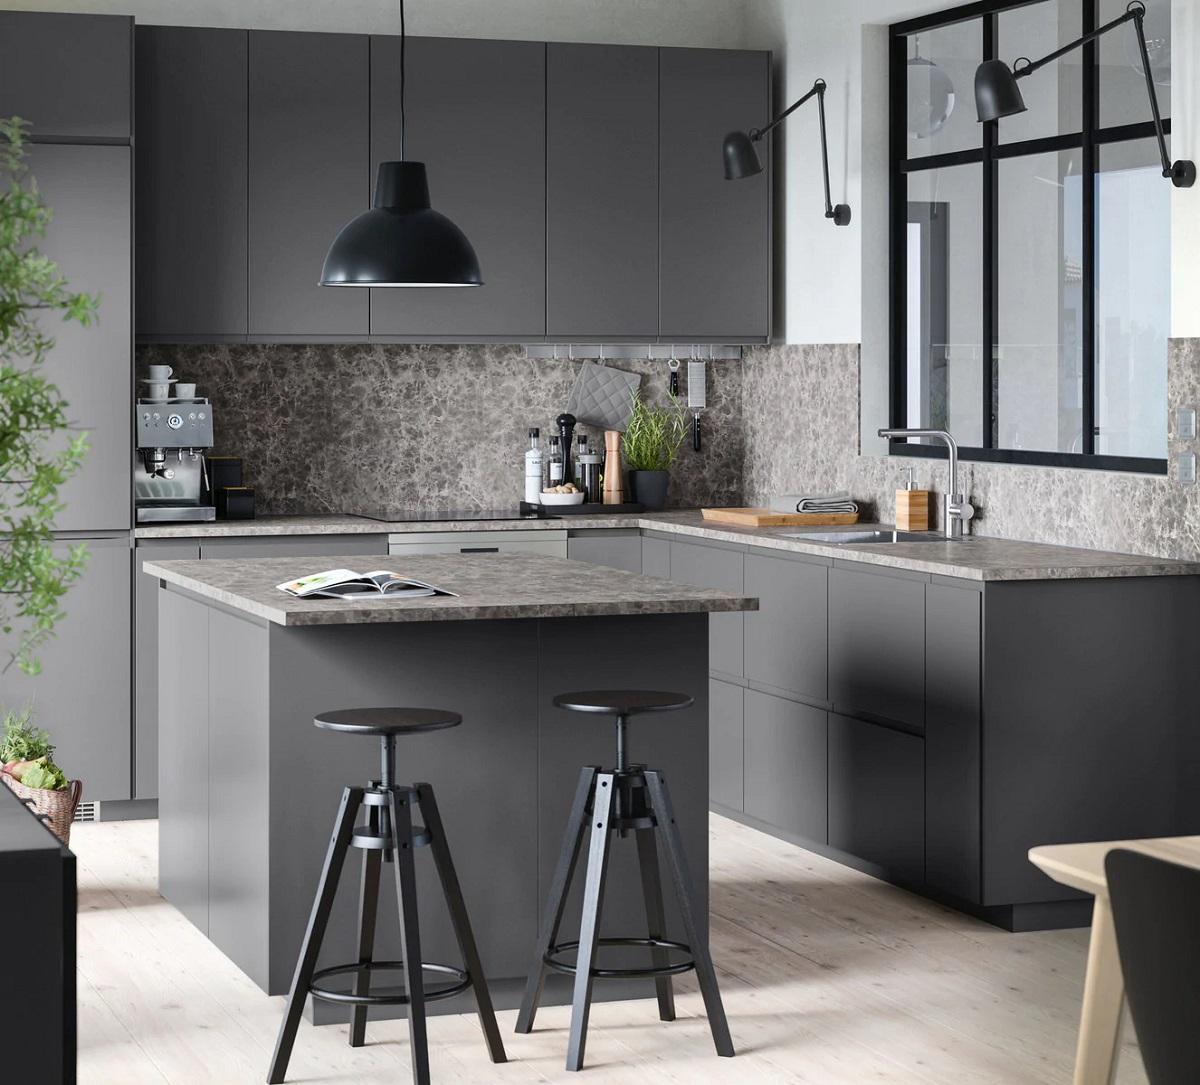 nuovo-catalogo-cucine-ikea-2020-6